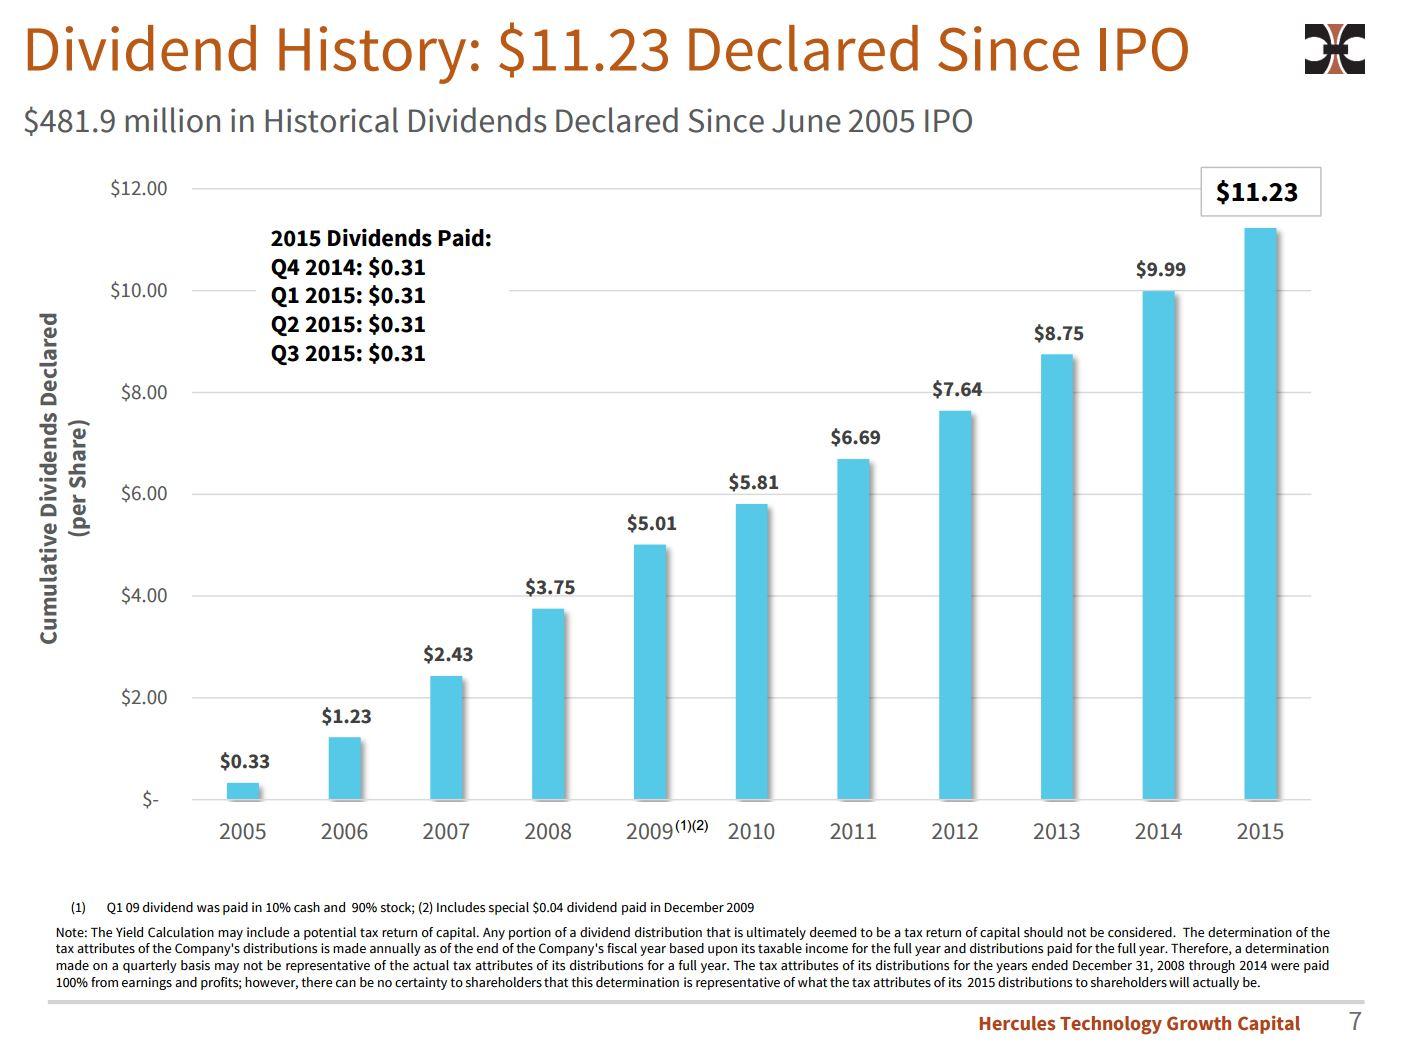 HTGC dividend history